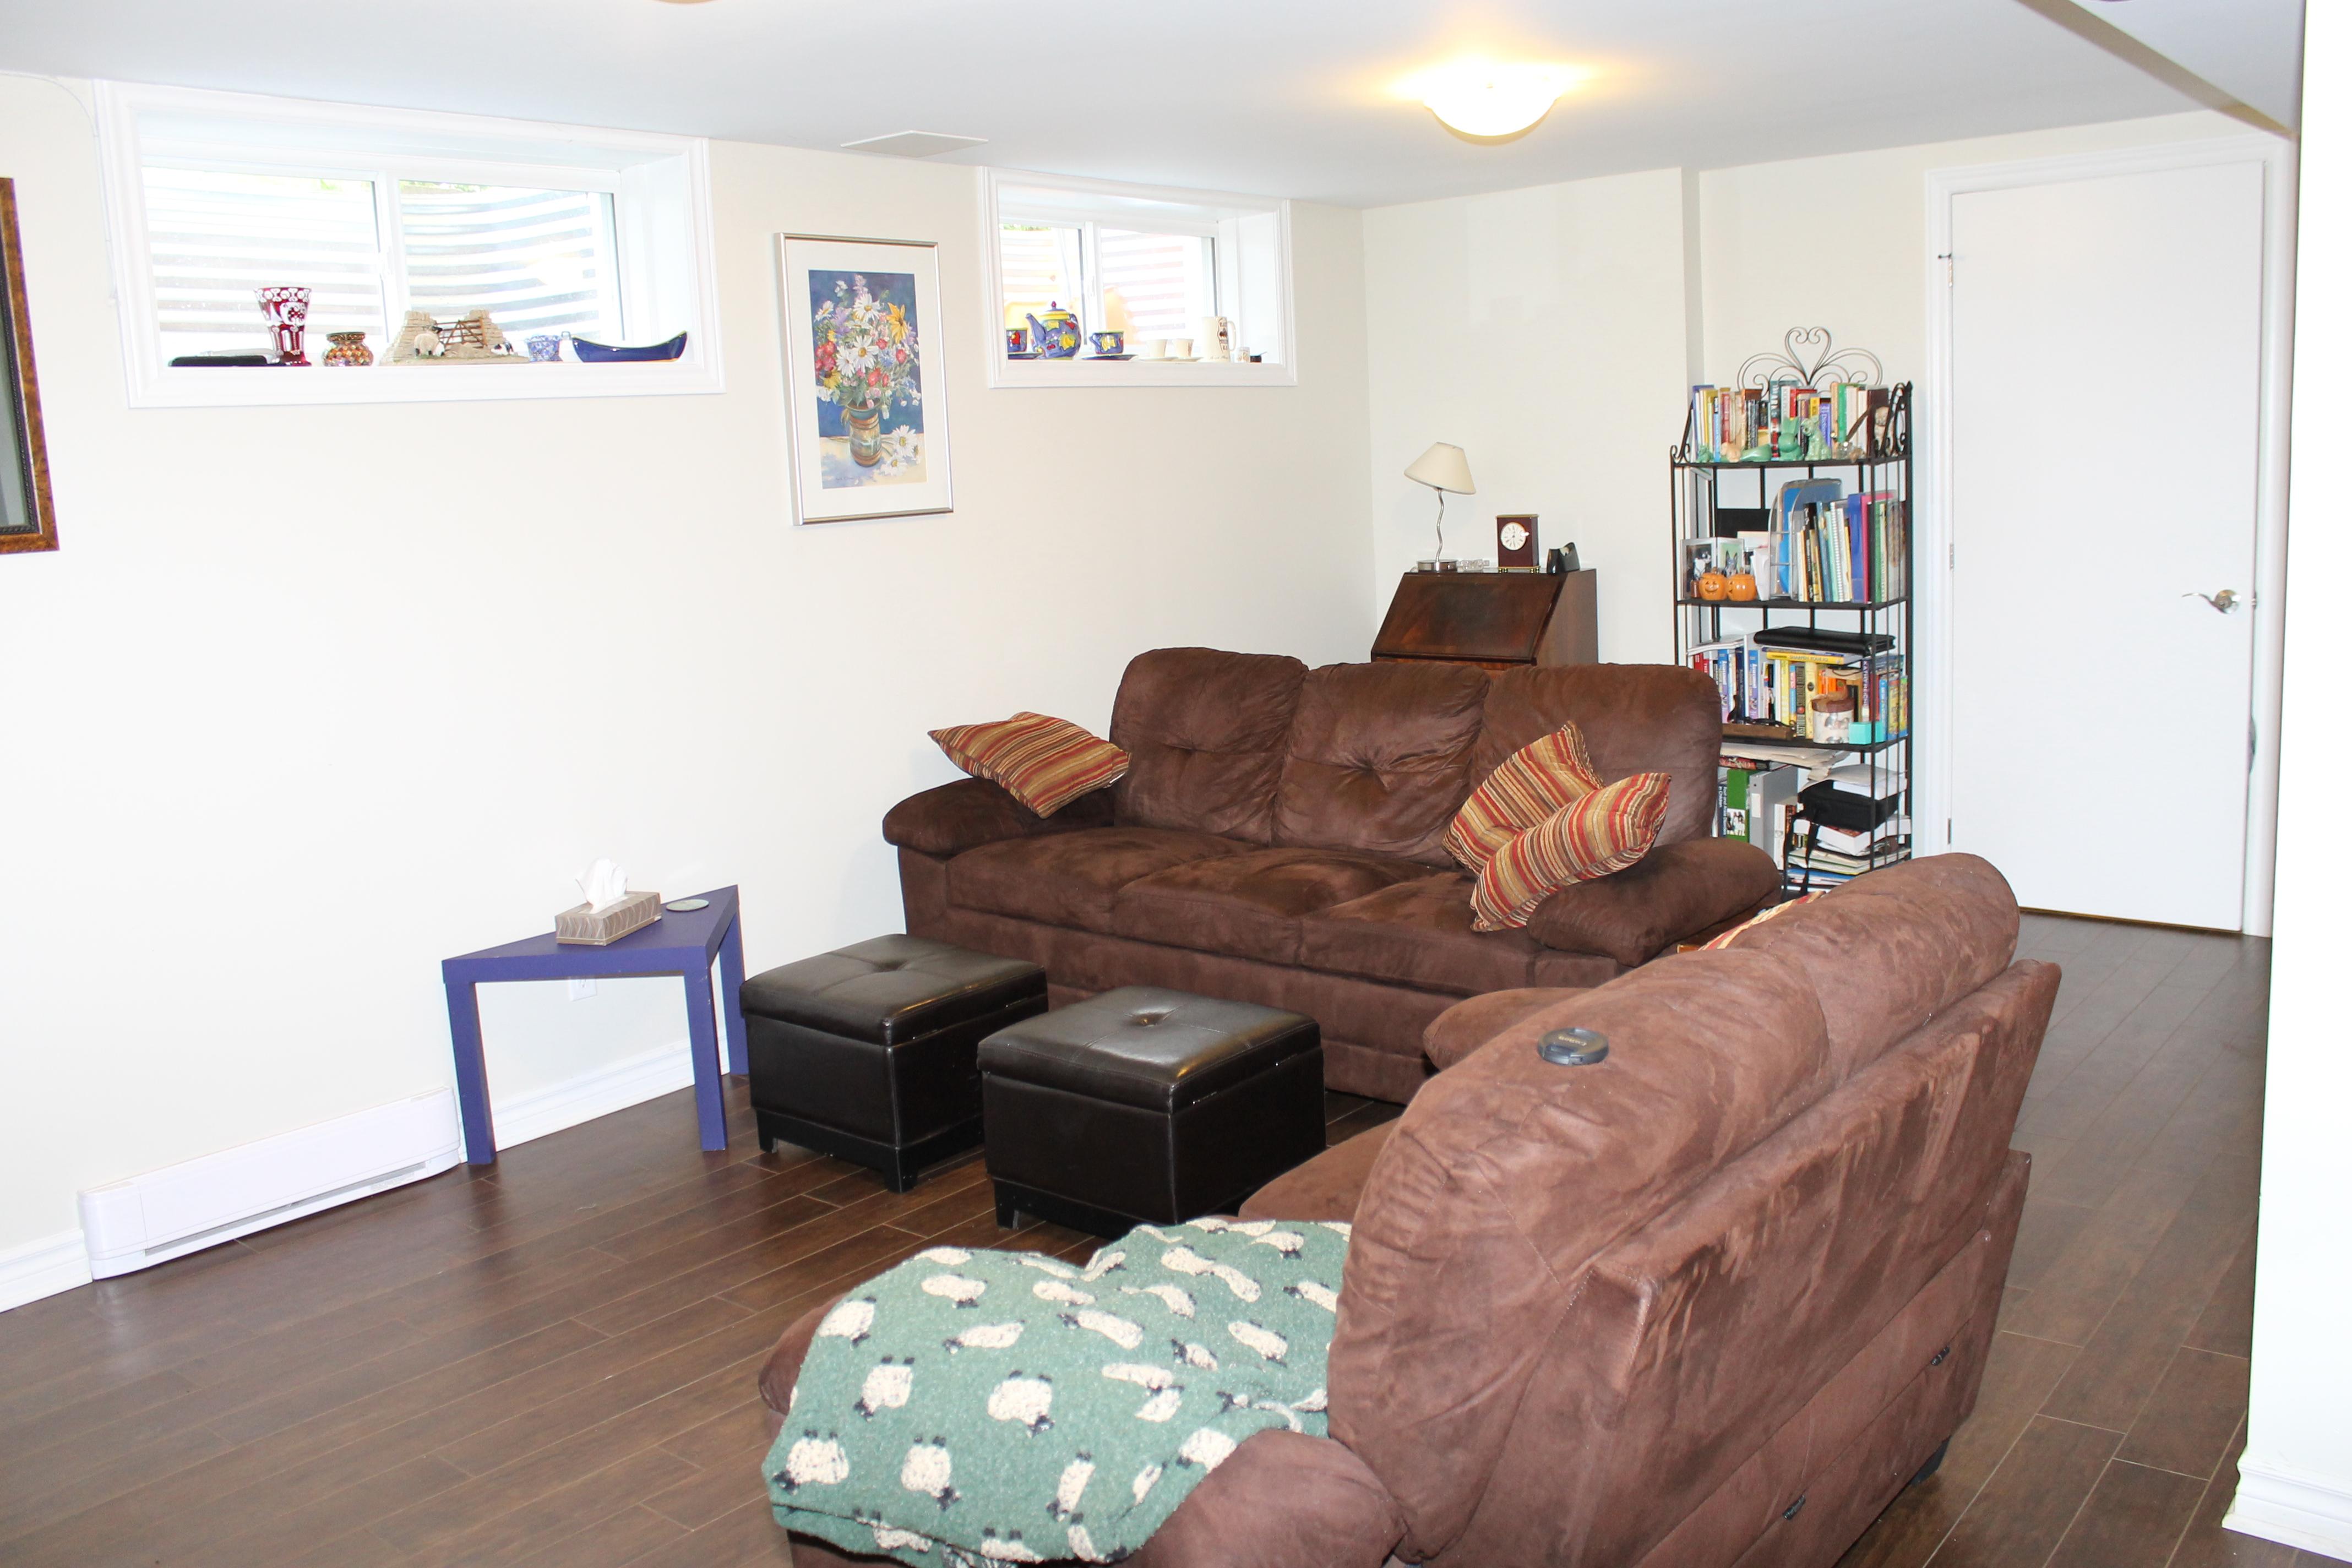 970 Shamir Avenue,Ottawa,Ontario,Canada,5 Bedrooms Bedrooms,2 BathroomsBathrooms,Multi-Family,Shamir Avenue,1082